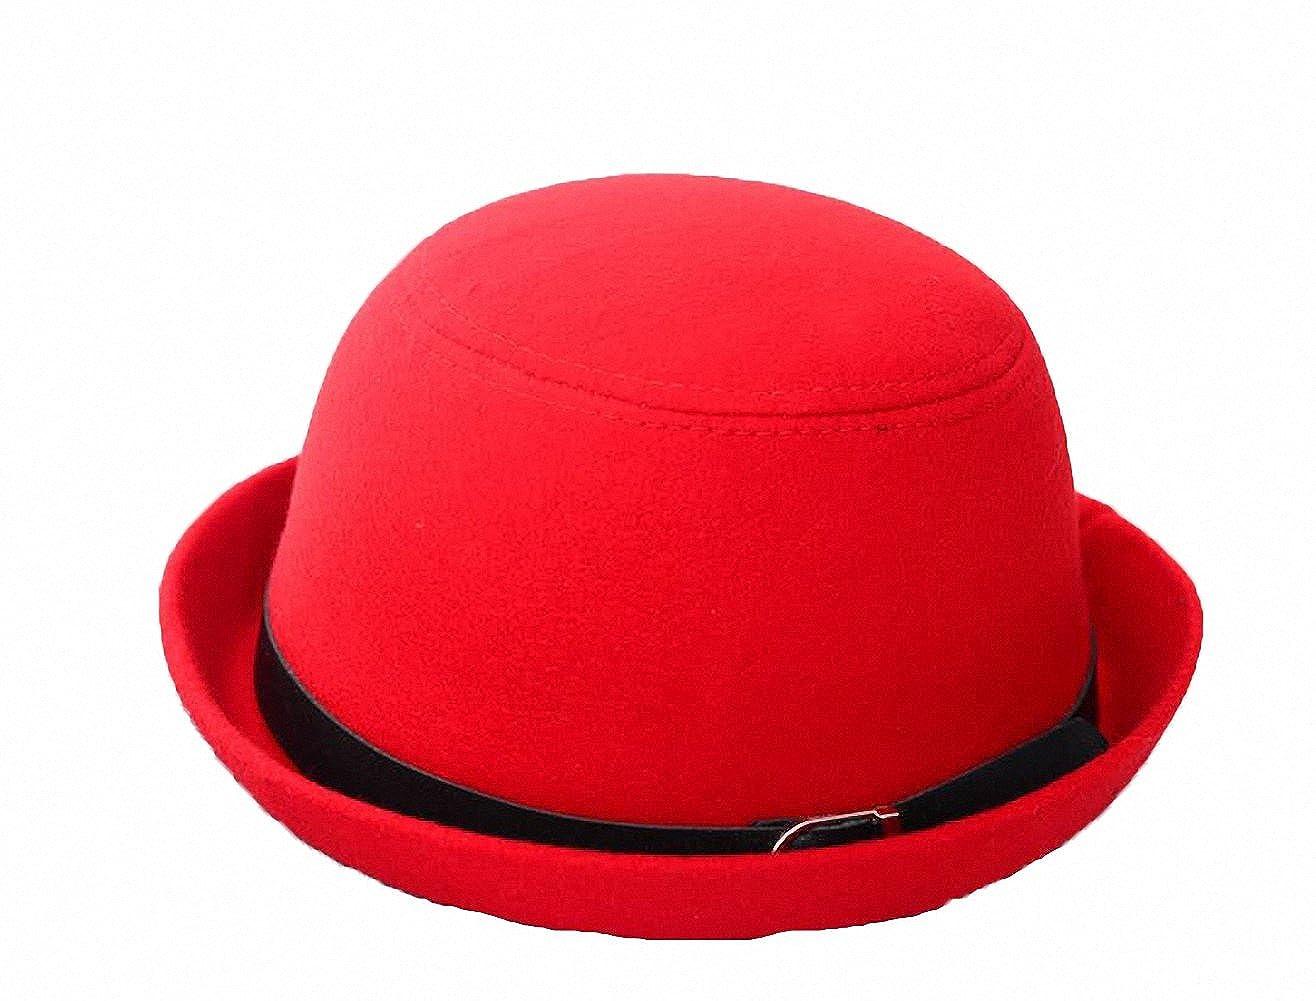 Tobe-U Cloche Bucket Bowler Fedora Floppy Derby Vintage Felt Hat Cap